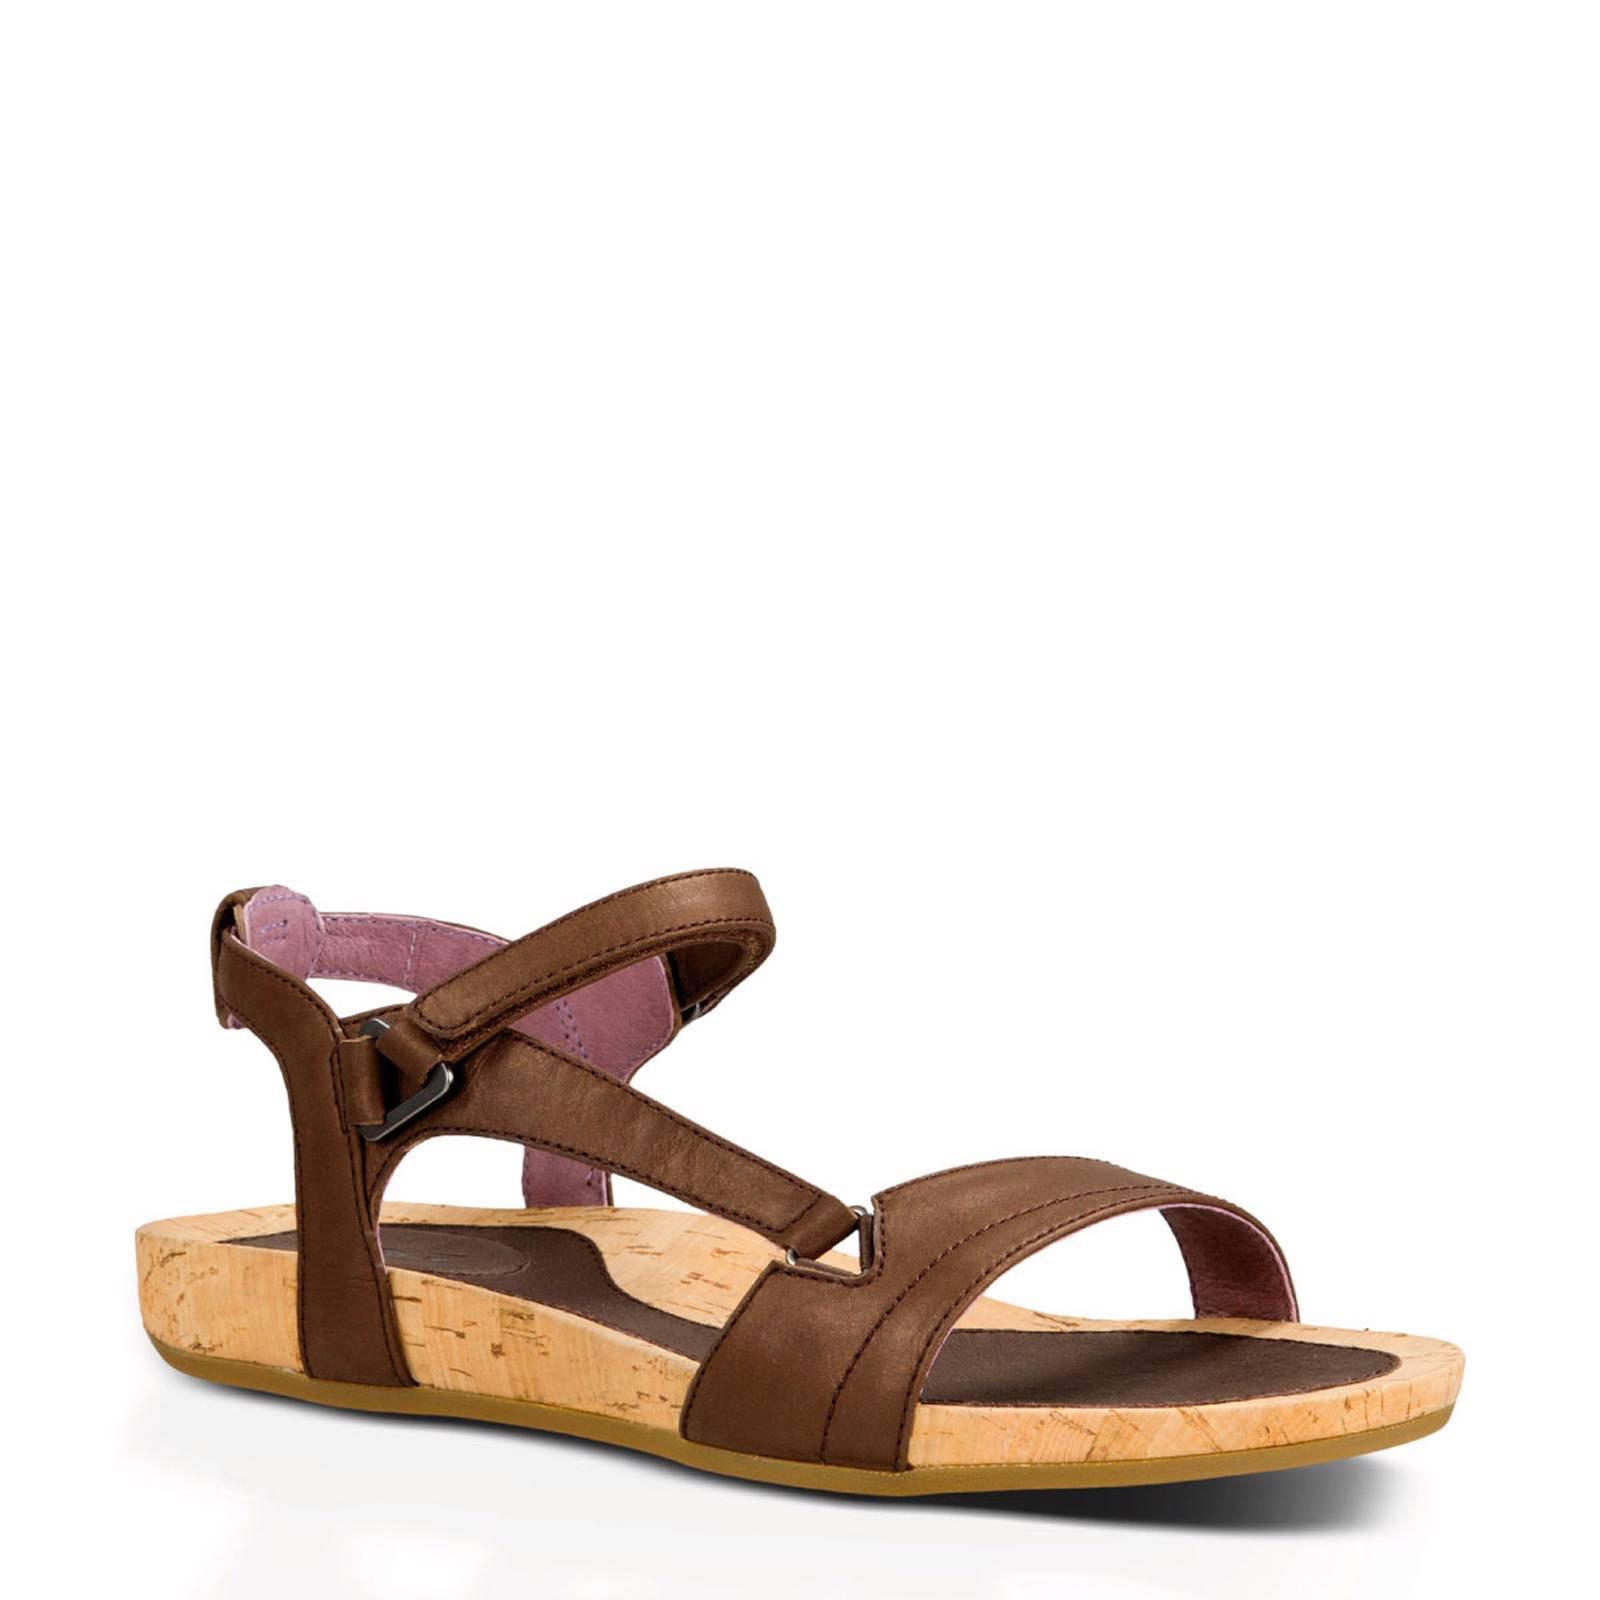 34b71e160451 Teva Capri Universal leren outdoor sandalen